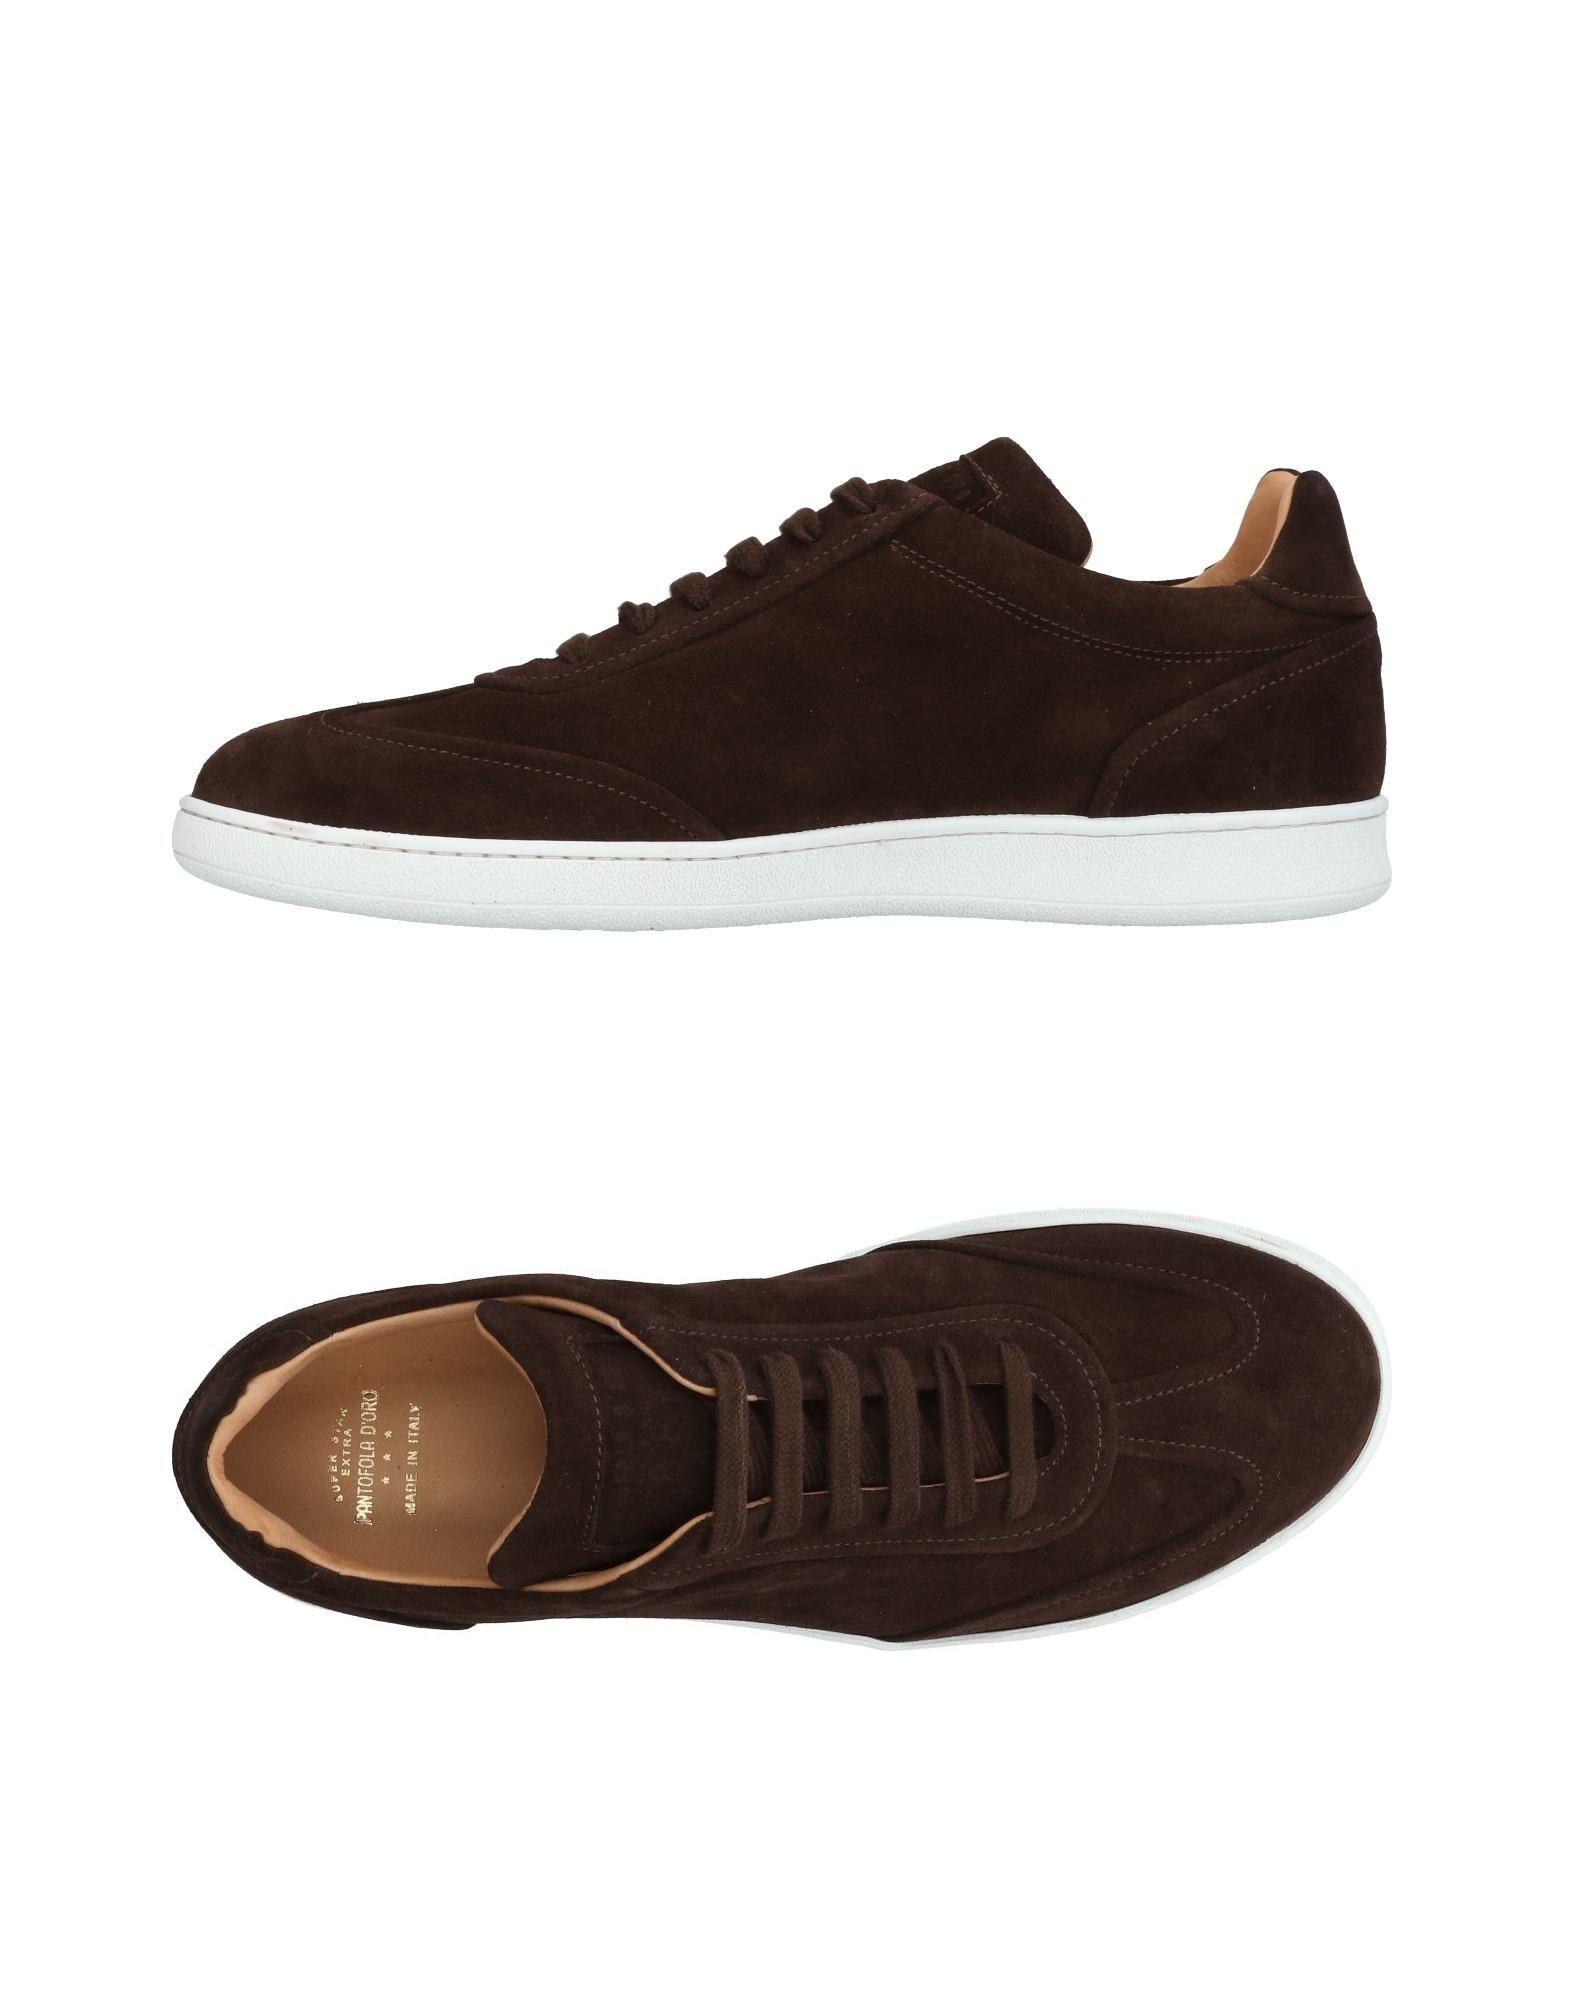 Pantofola D'oro Sneakers Herren  11455603WB Neue Schuhe